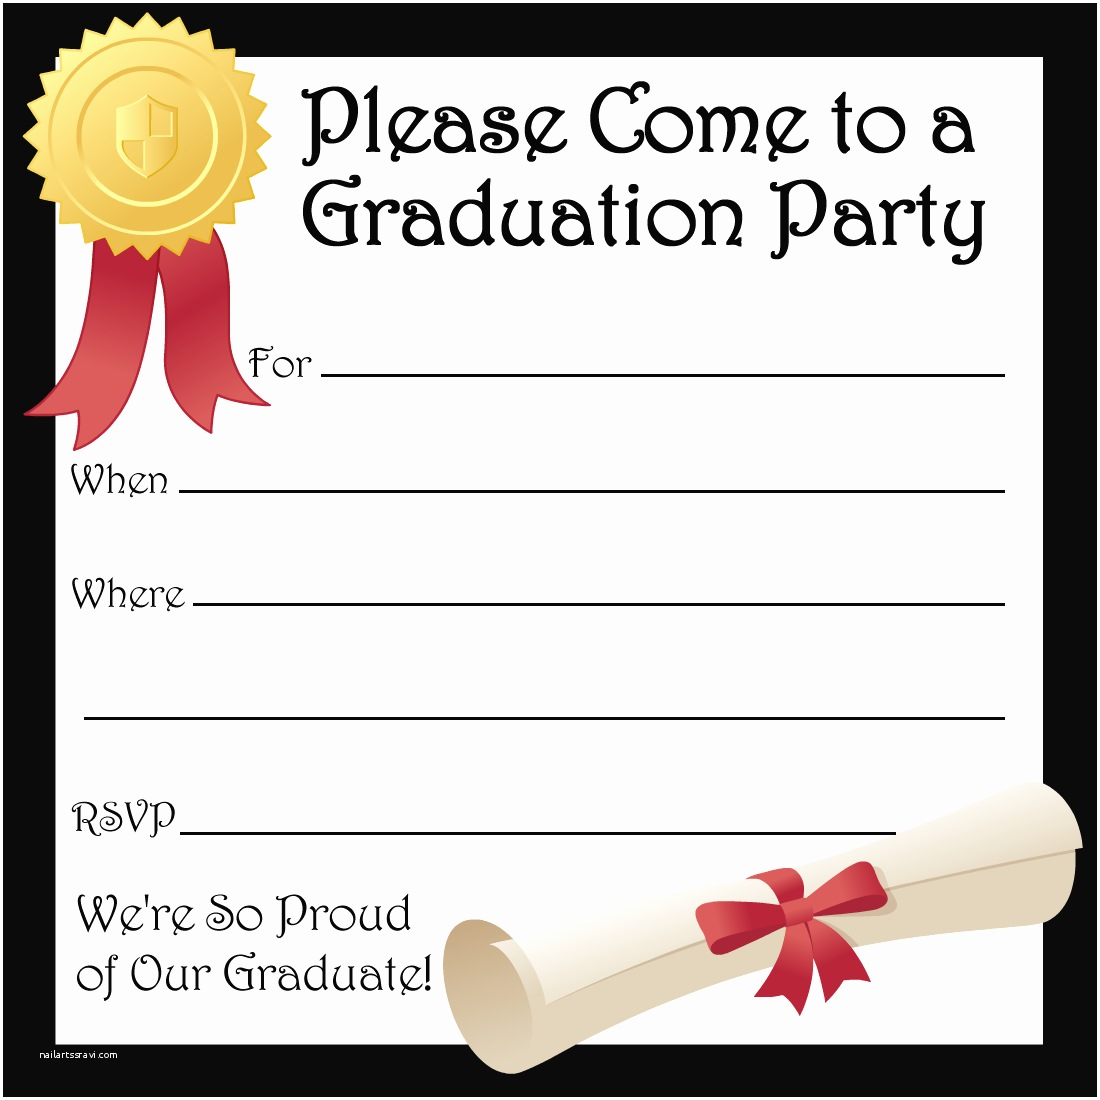 Sample Graduation Invitation Free Printable Graduation Party Invitations